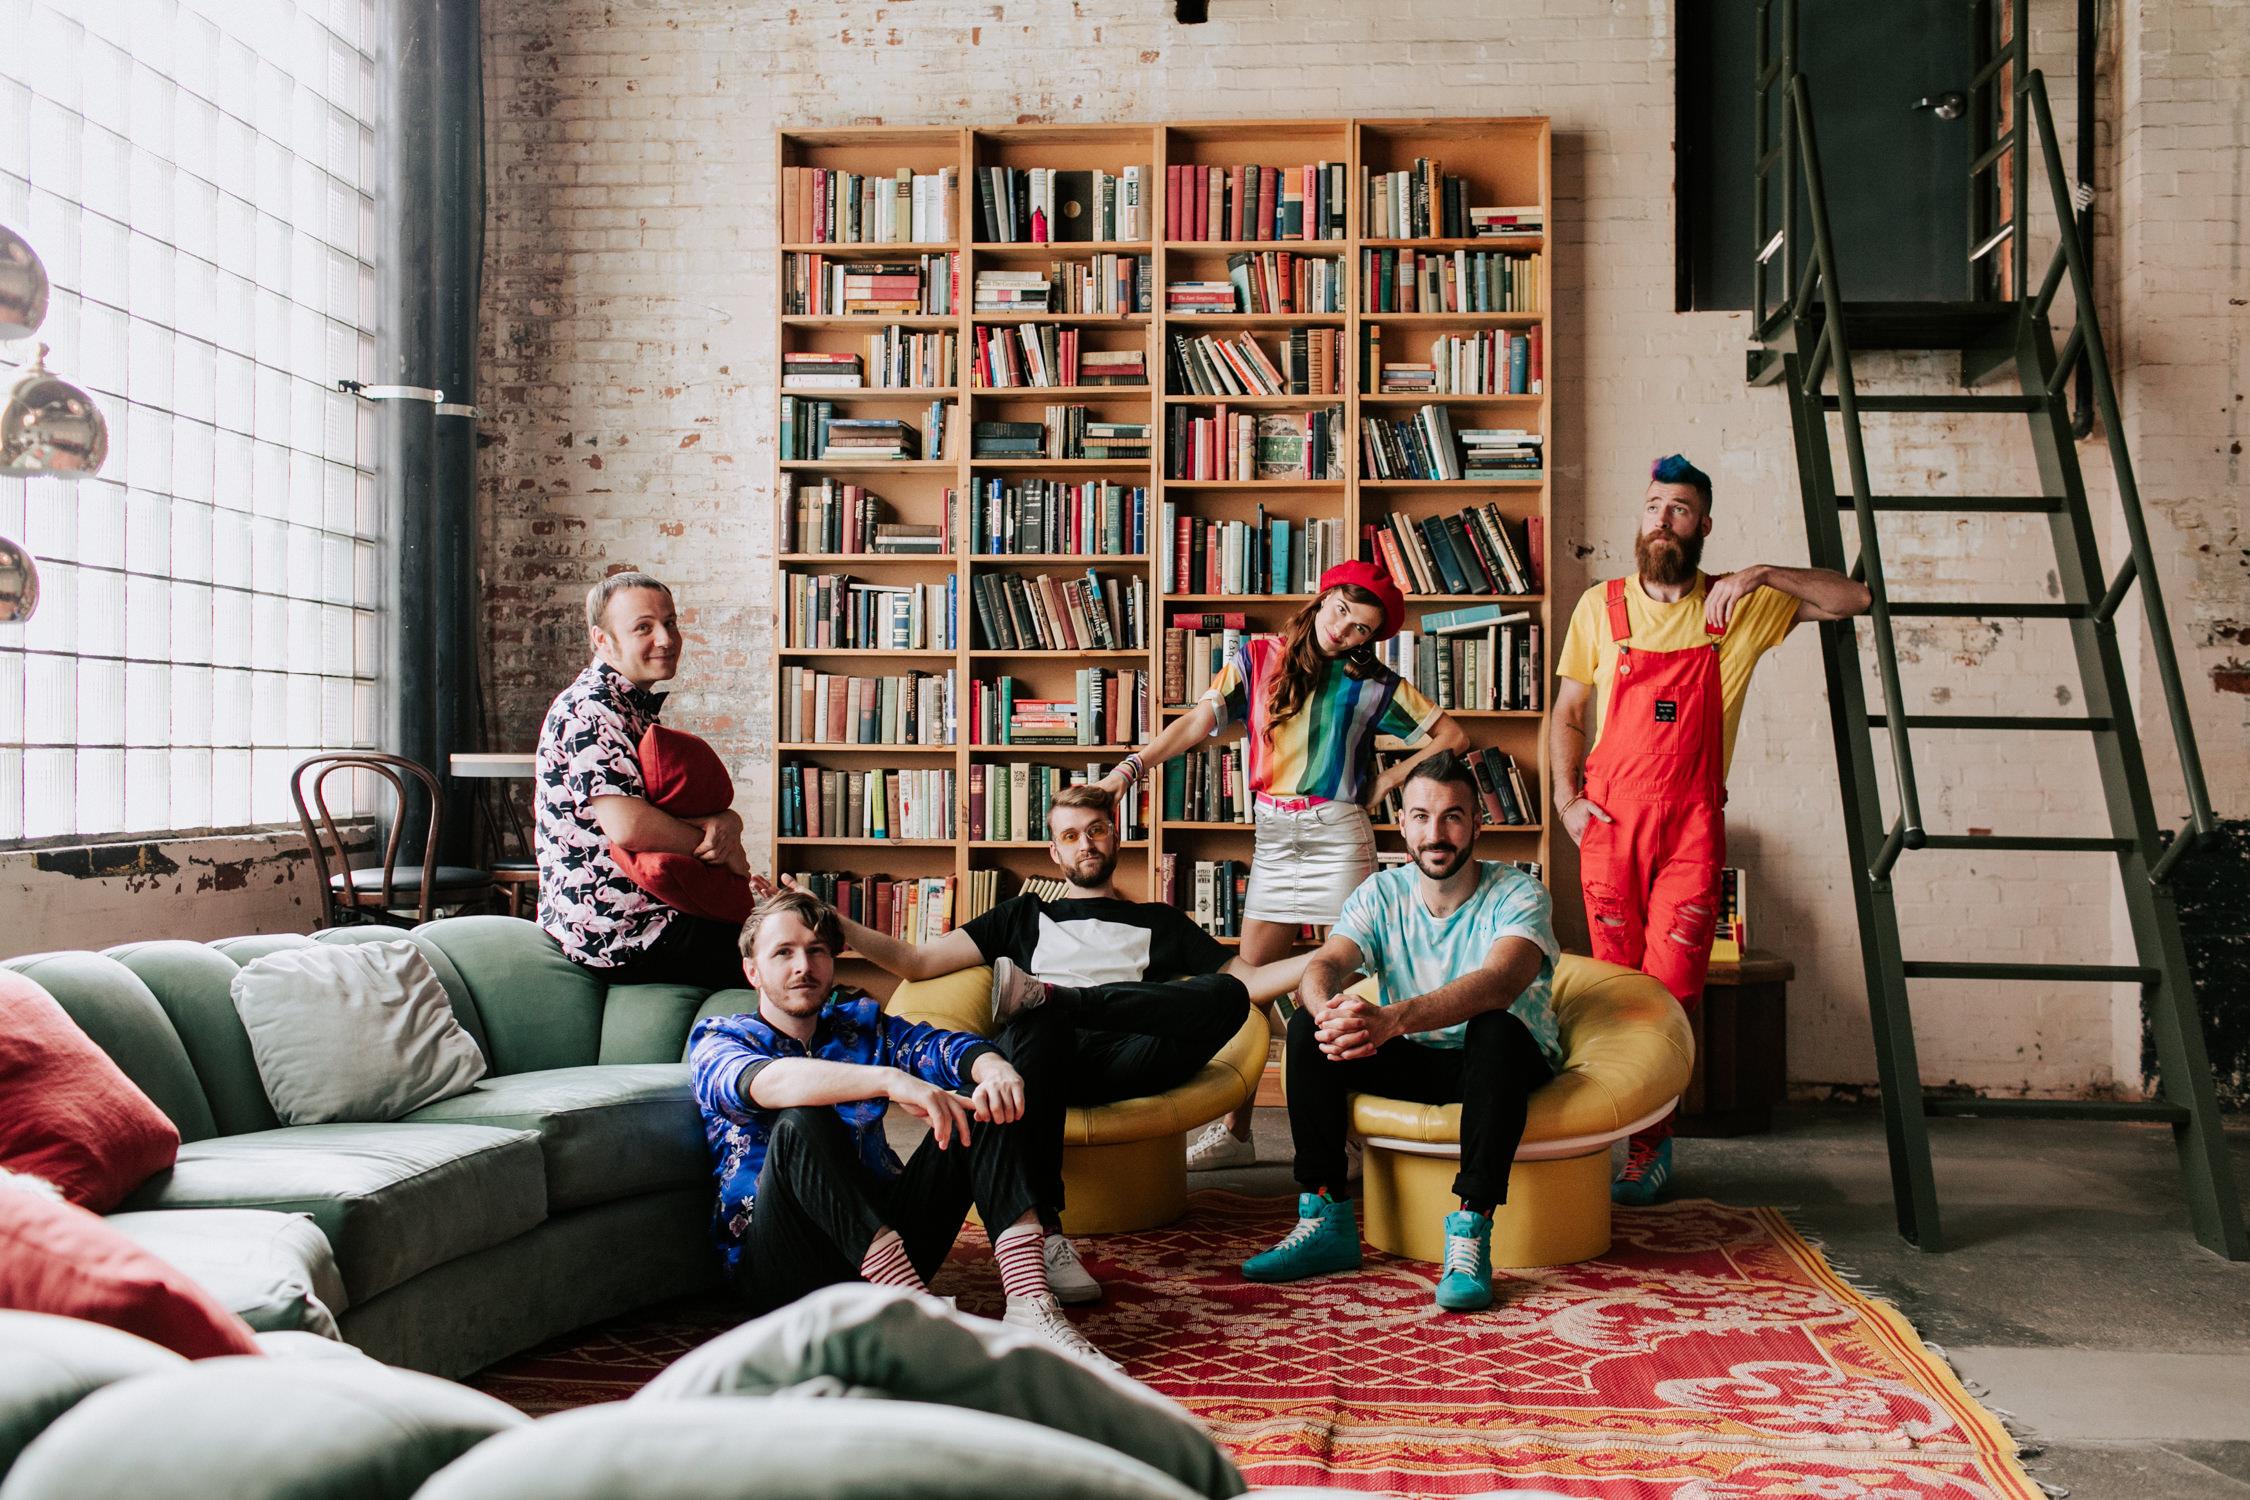 misterwives-band-the-van-buren-greenroom-backstage-AnnaLeeMedia